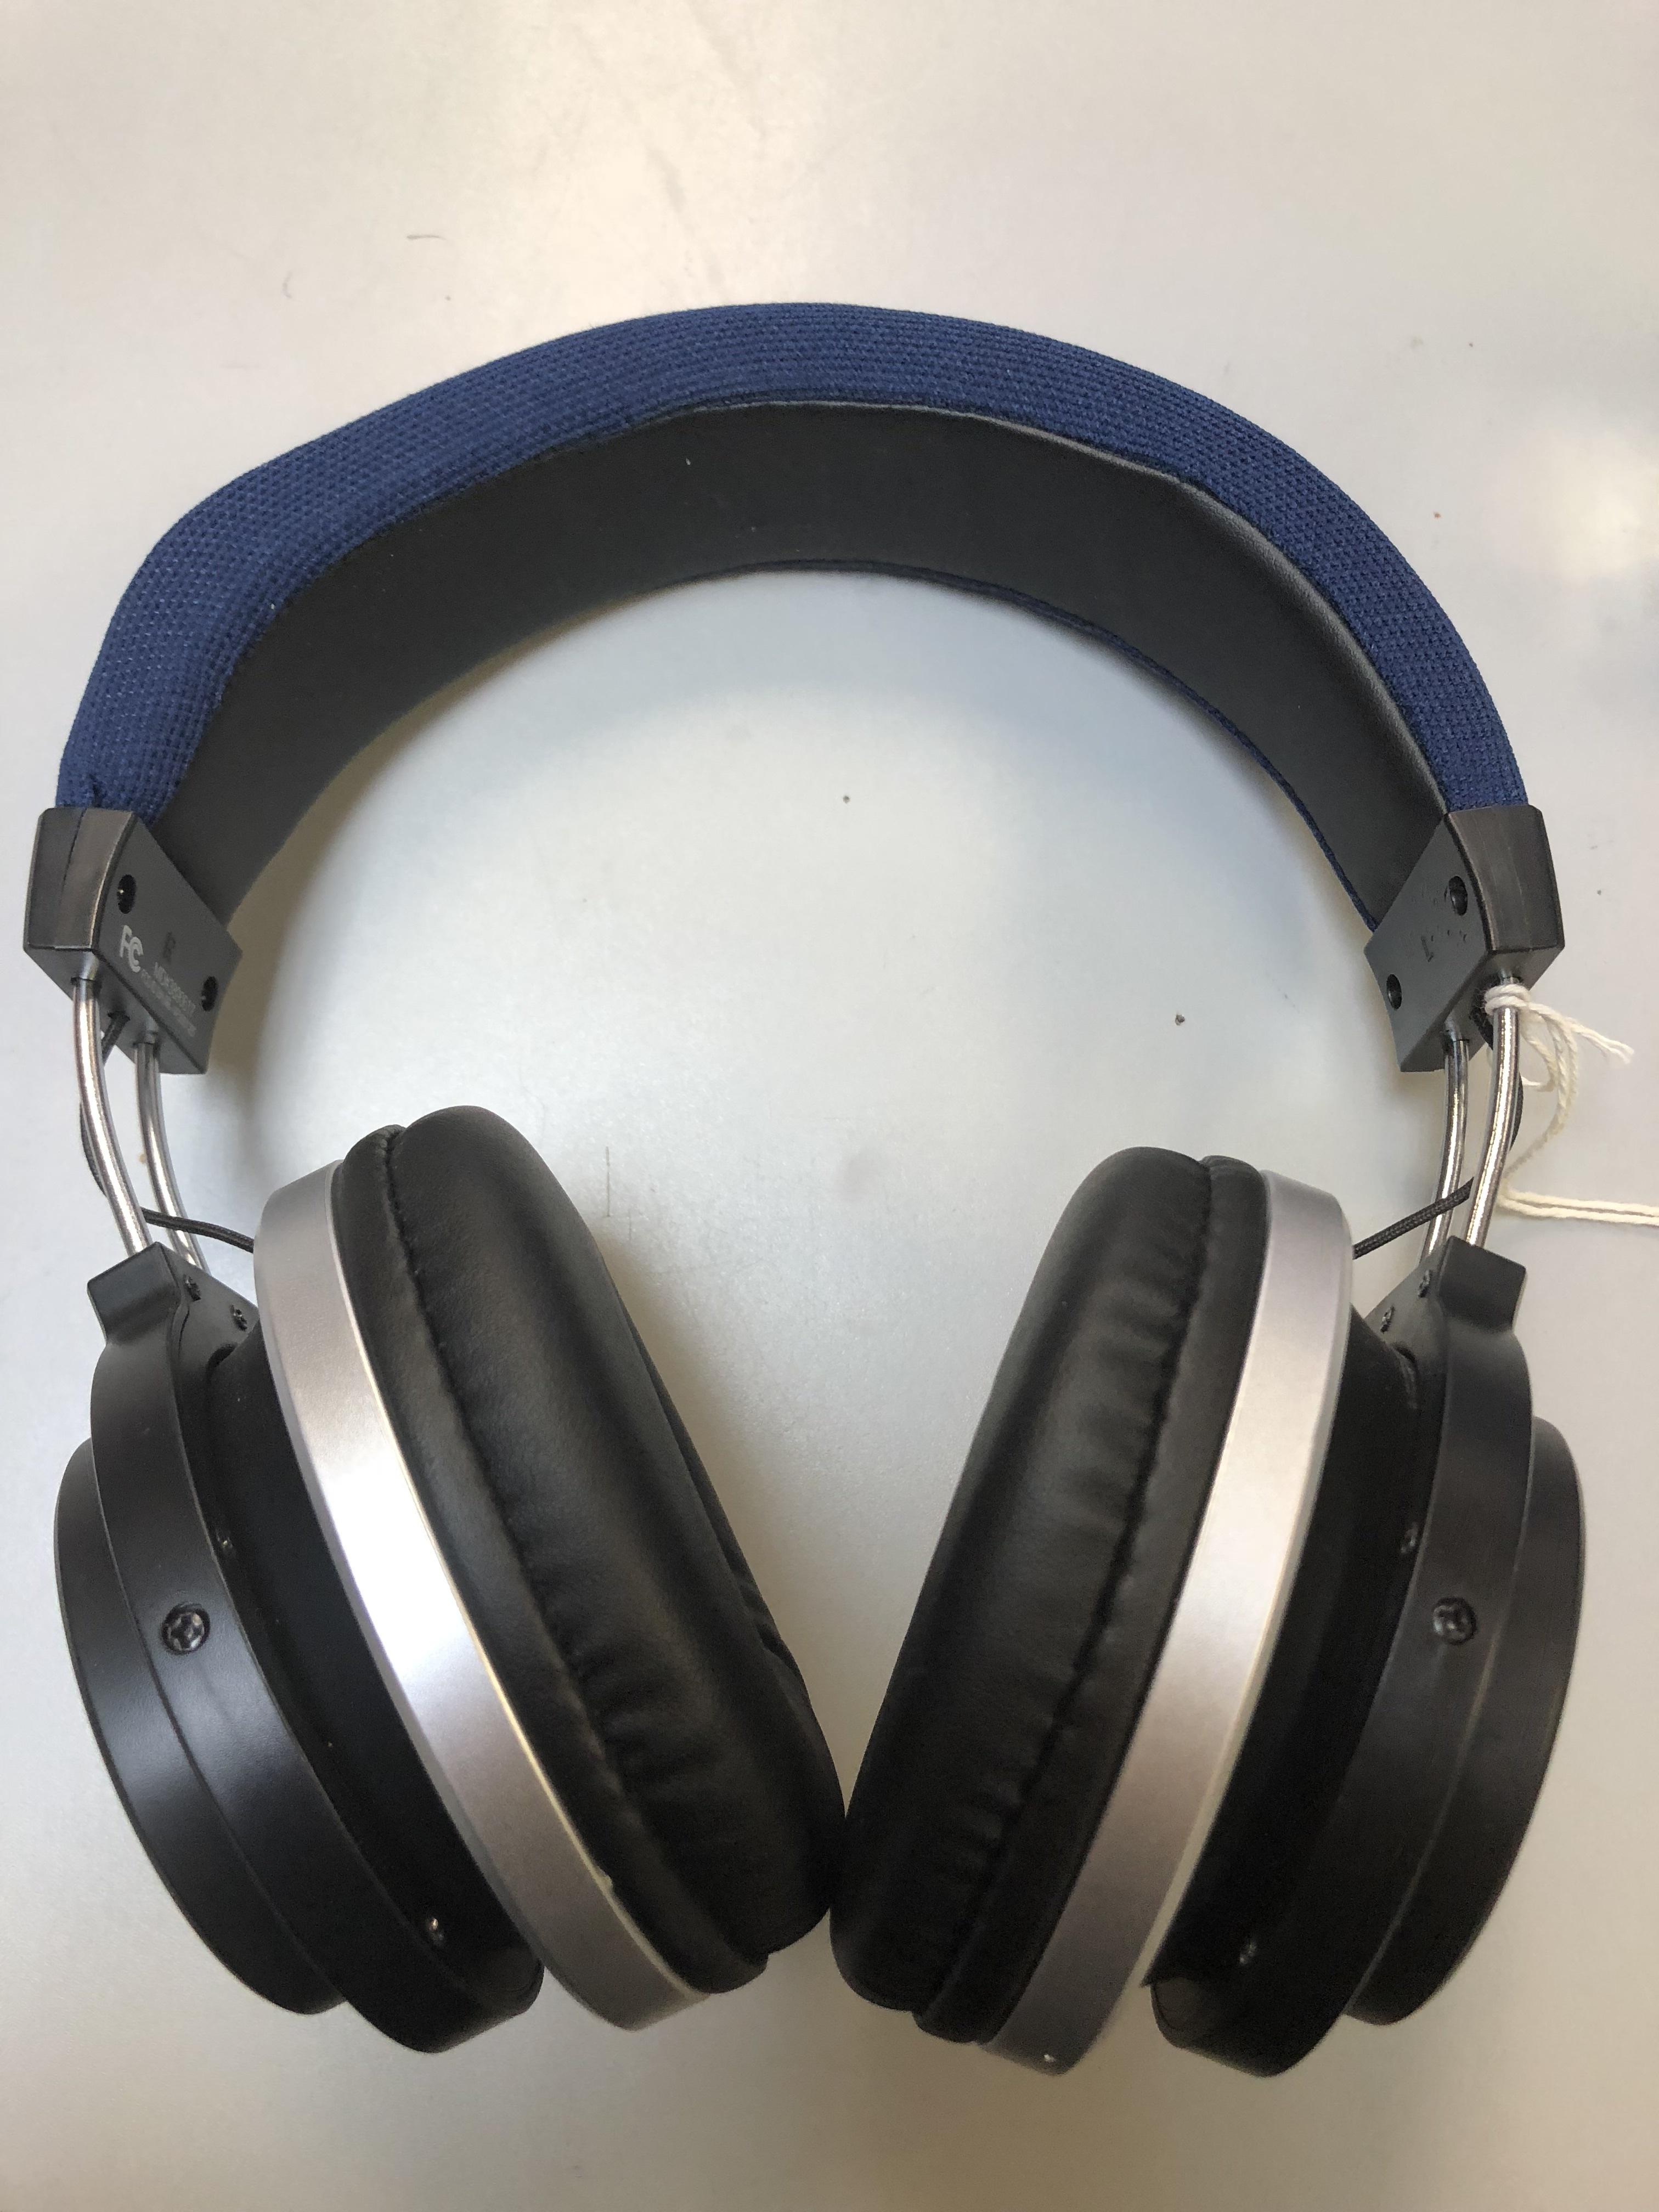 VIVITAR - 3890617 - HEADPHONE STEREO/AUDIO/RADIO